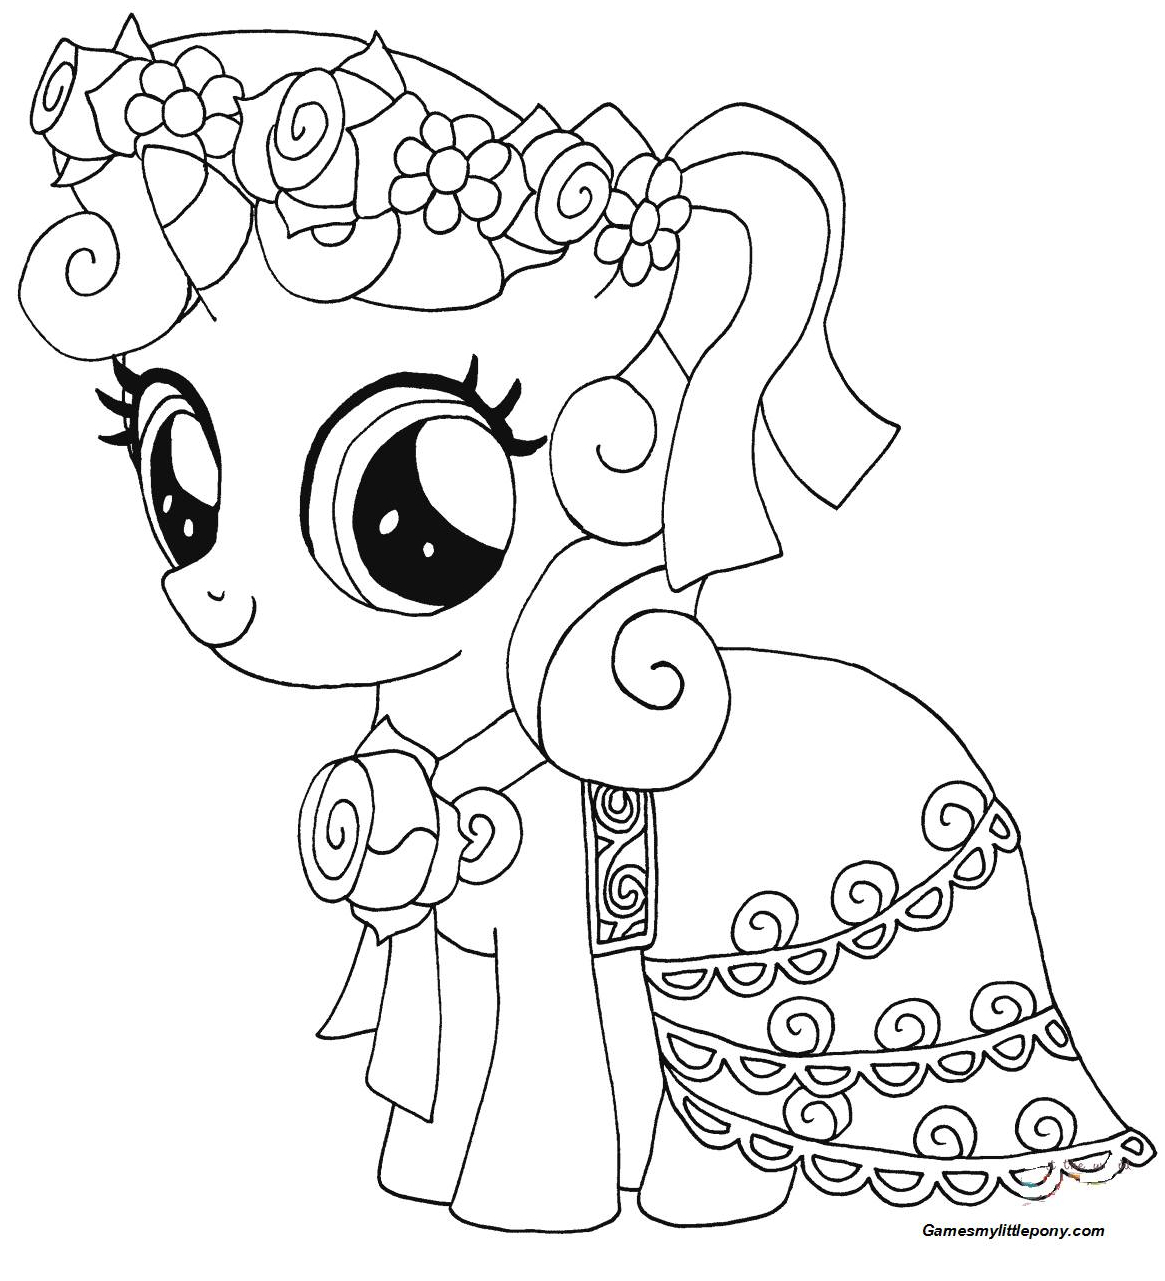 My Little Pony Sweetie Belle from My Little Pony